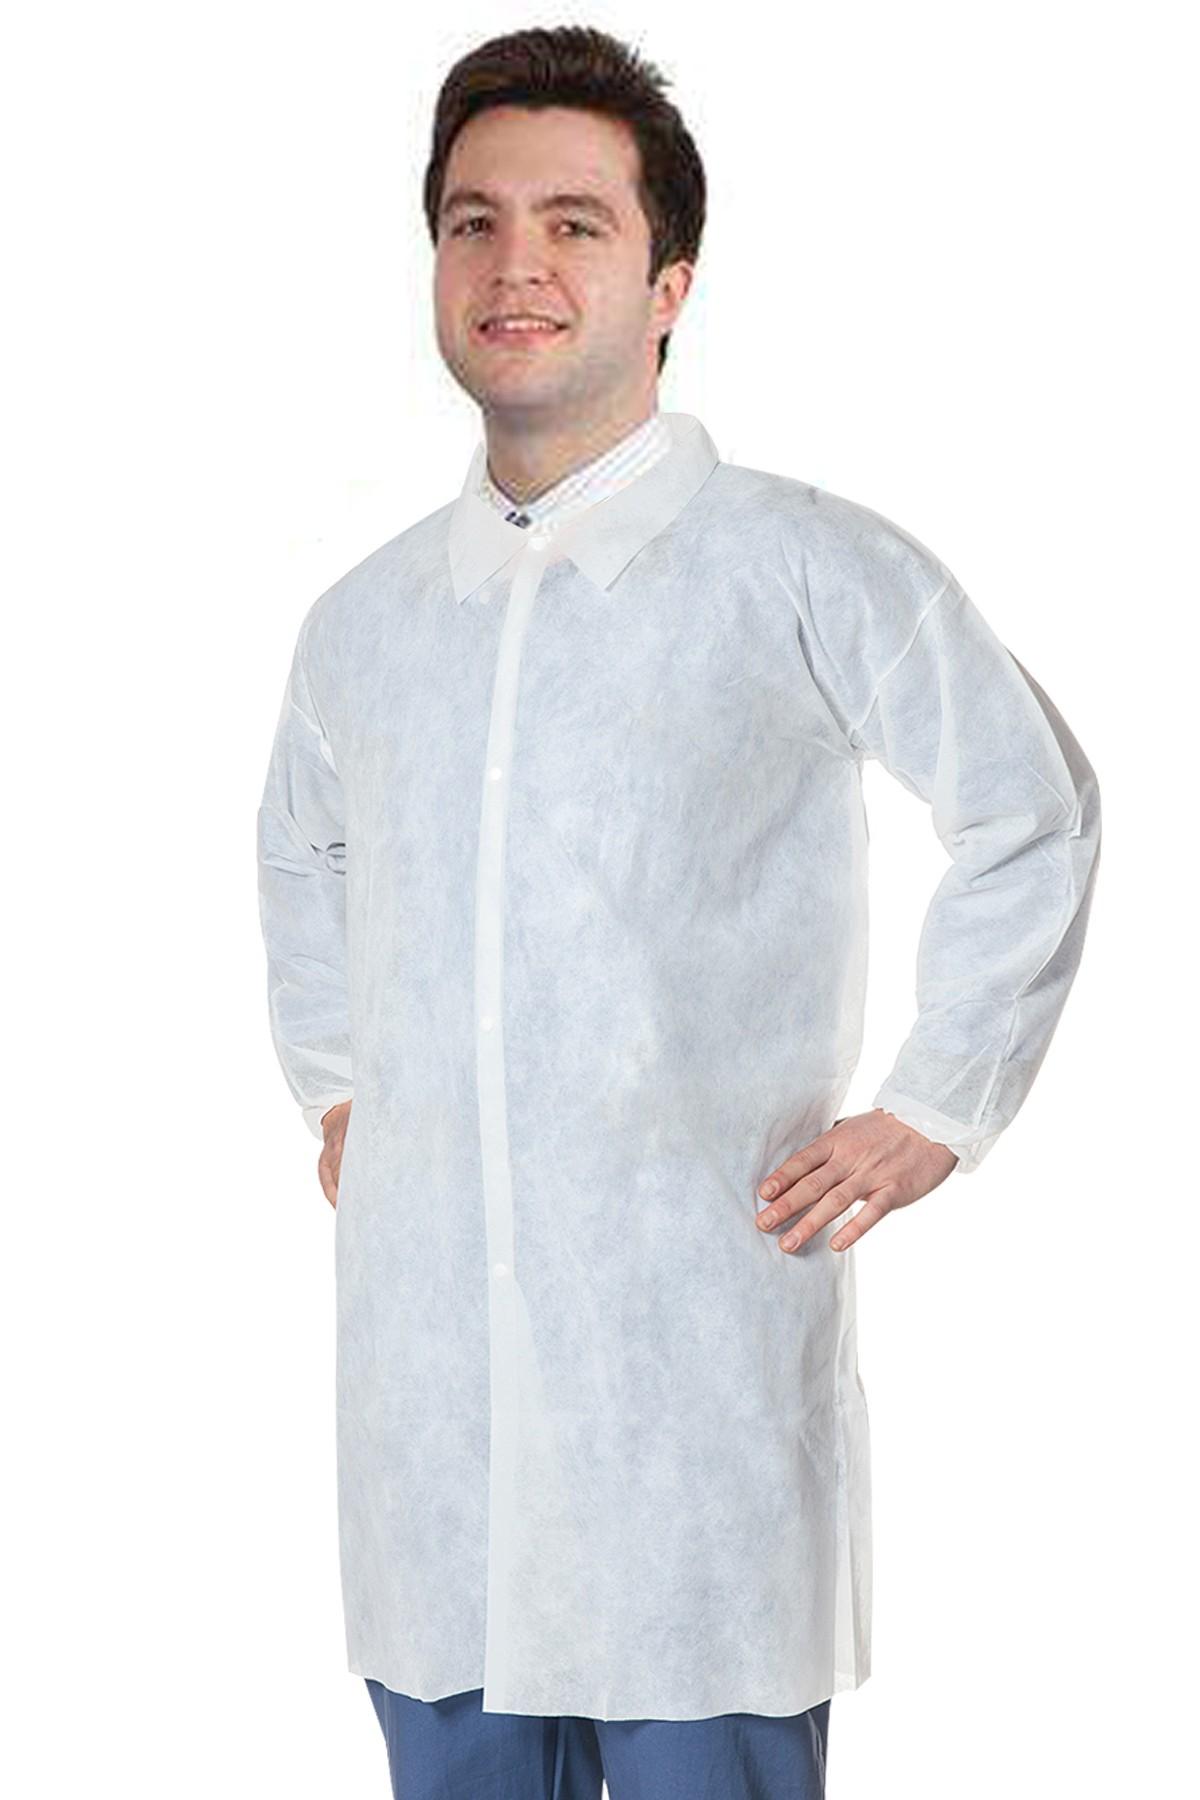 Disposable Labcoats